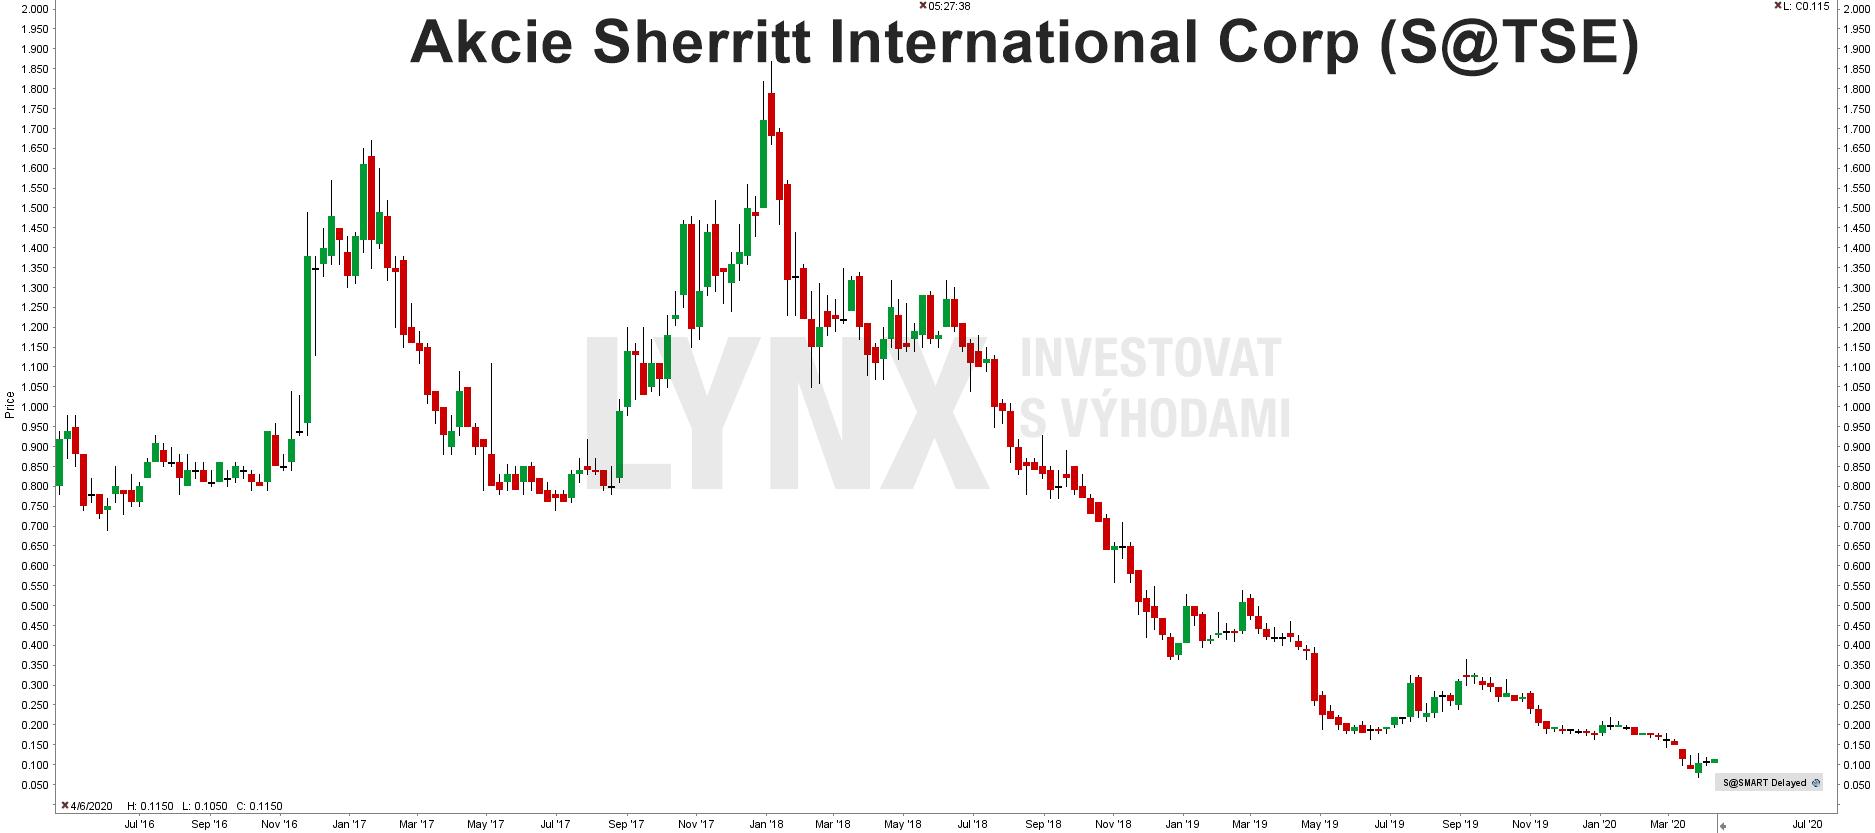 Graf akcie Sherritt International